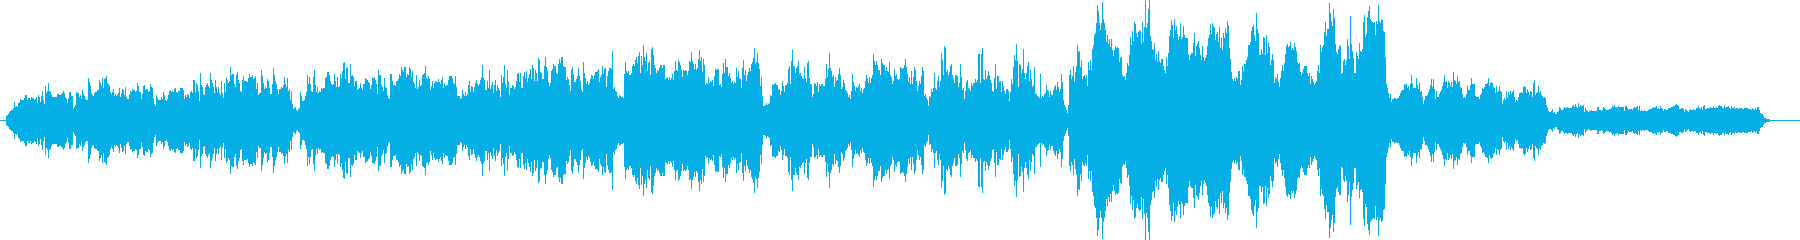 Te Deumの前奏曲の再生済みの波形